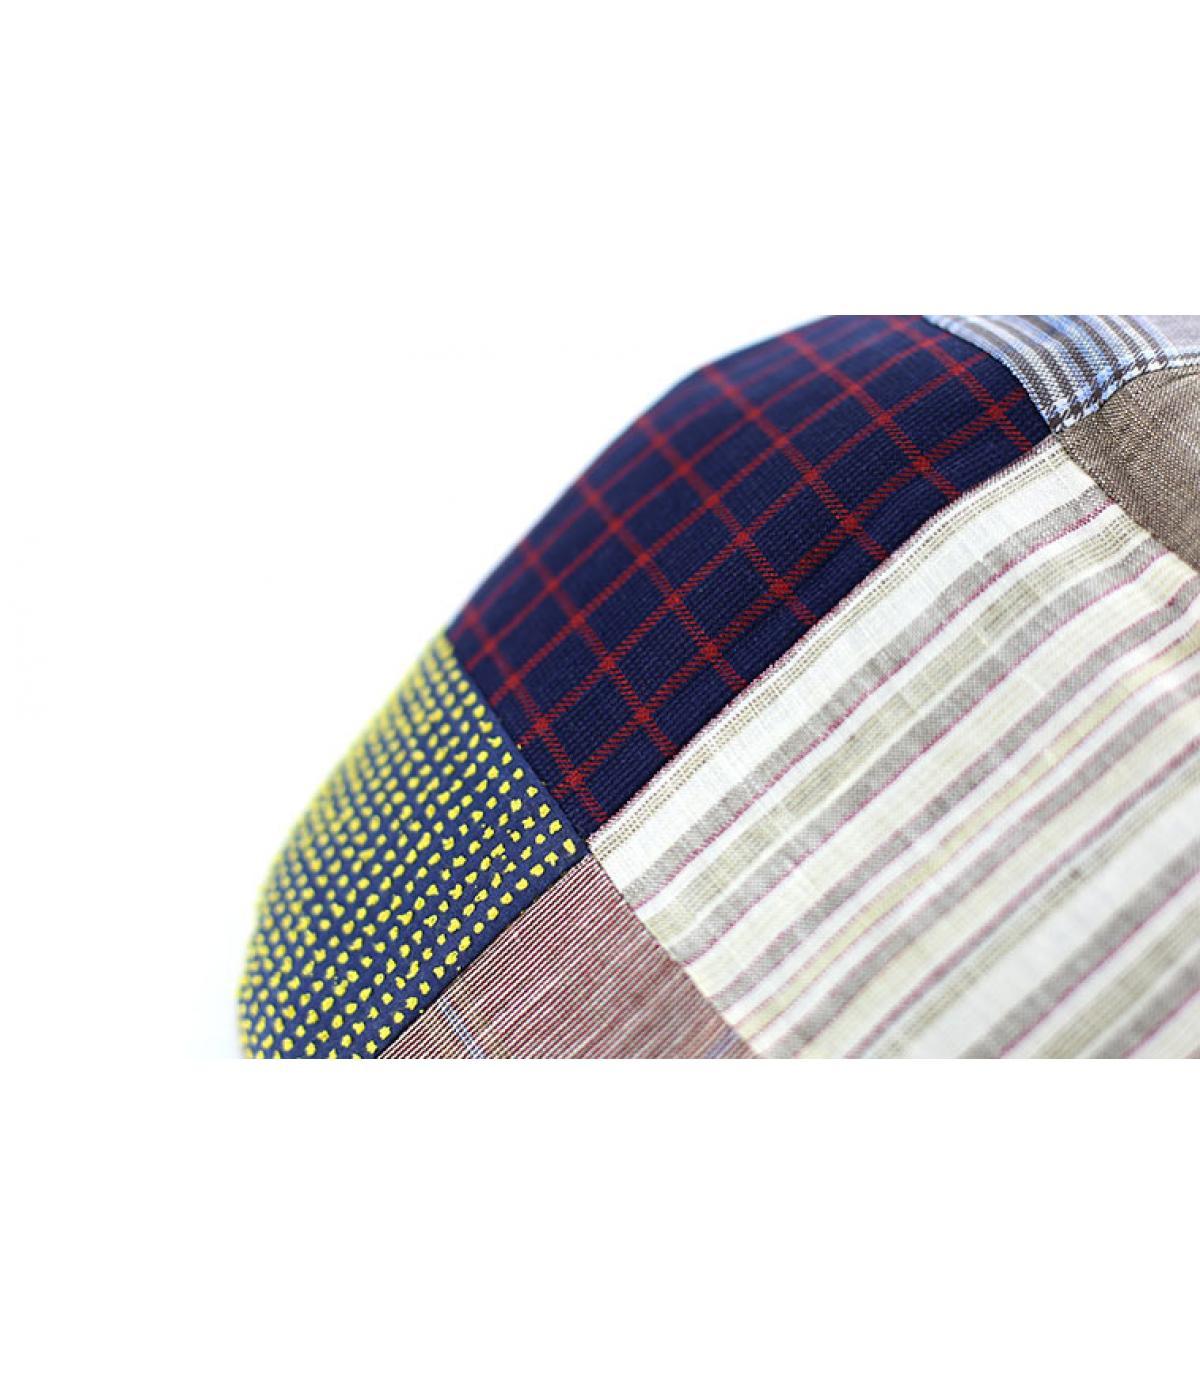 Detalles Boxer patchwork imagen 4